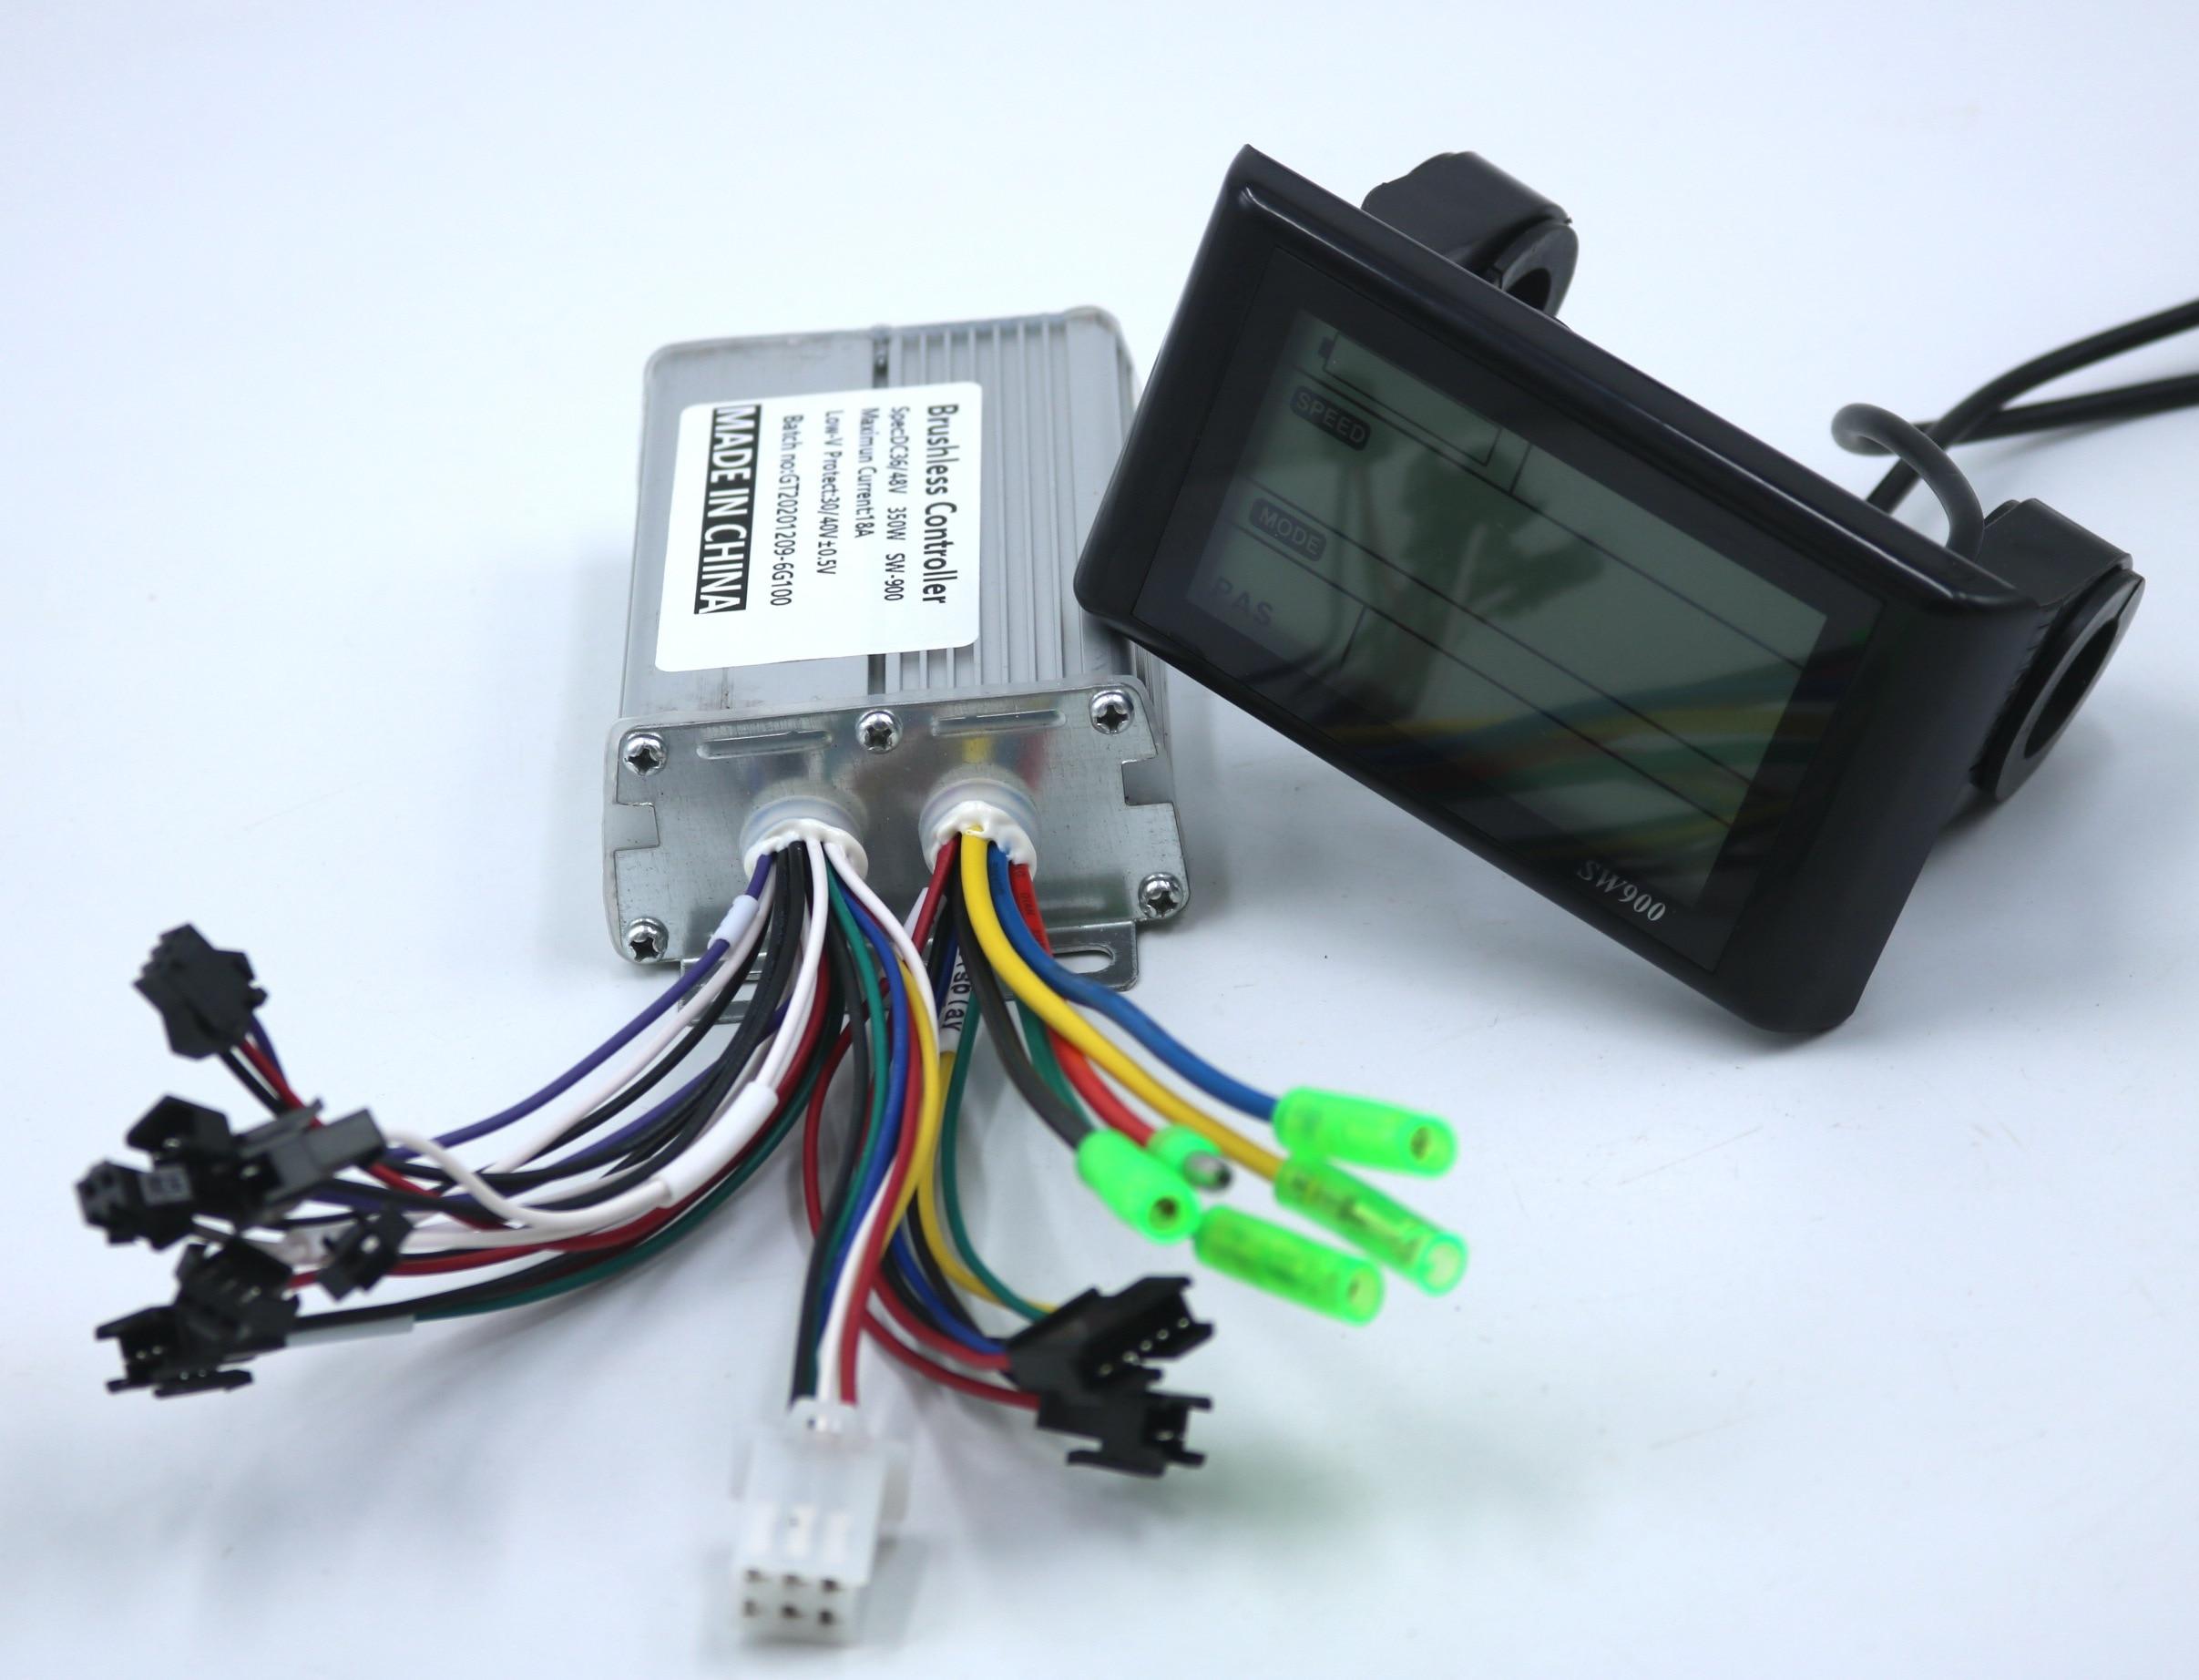 Greentime 36V 48V 350W 18A мотор-контроллер постоянного тока без щетки контроллер электровелосипеда + SW-900Display один комплект